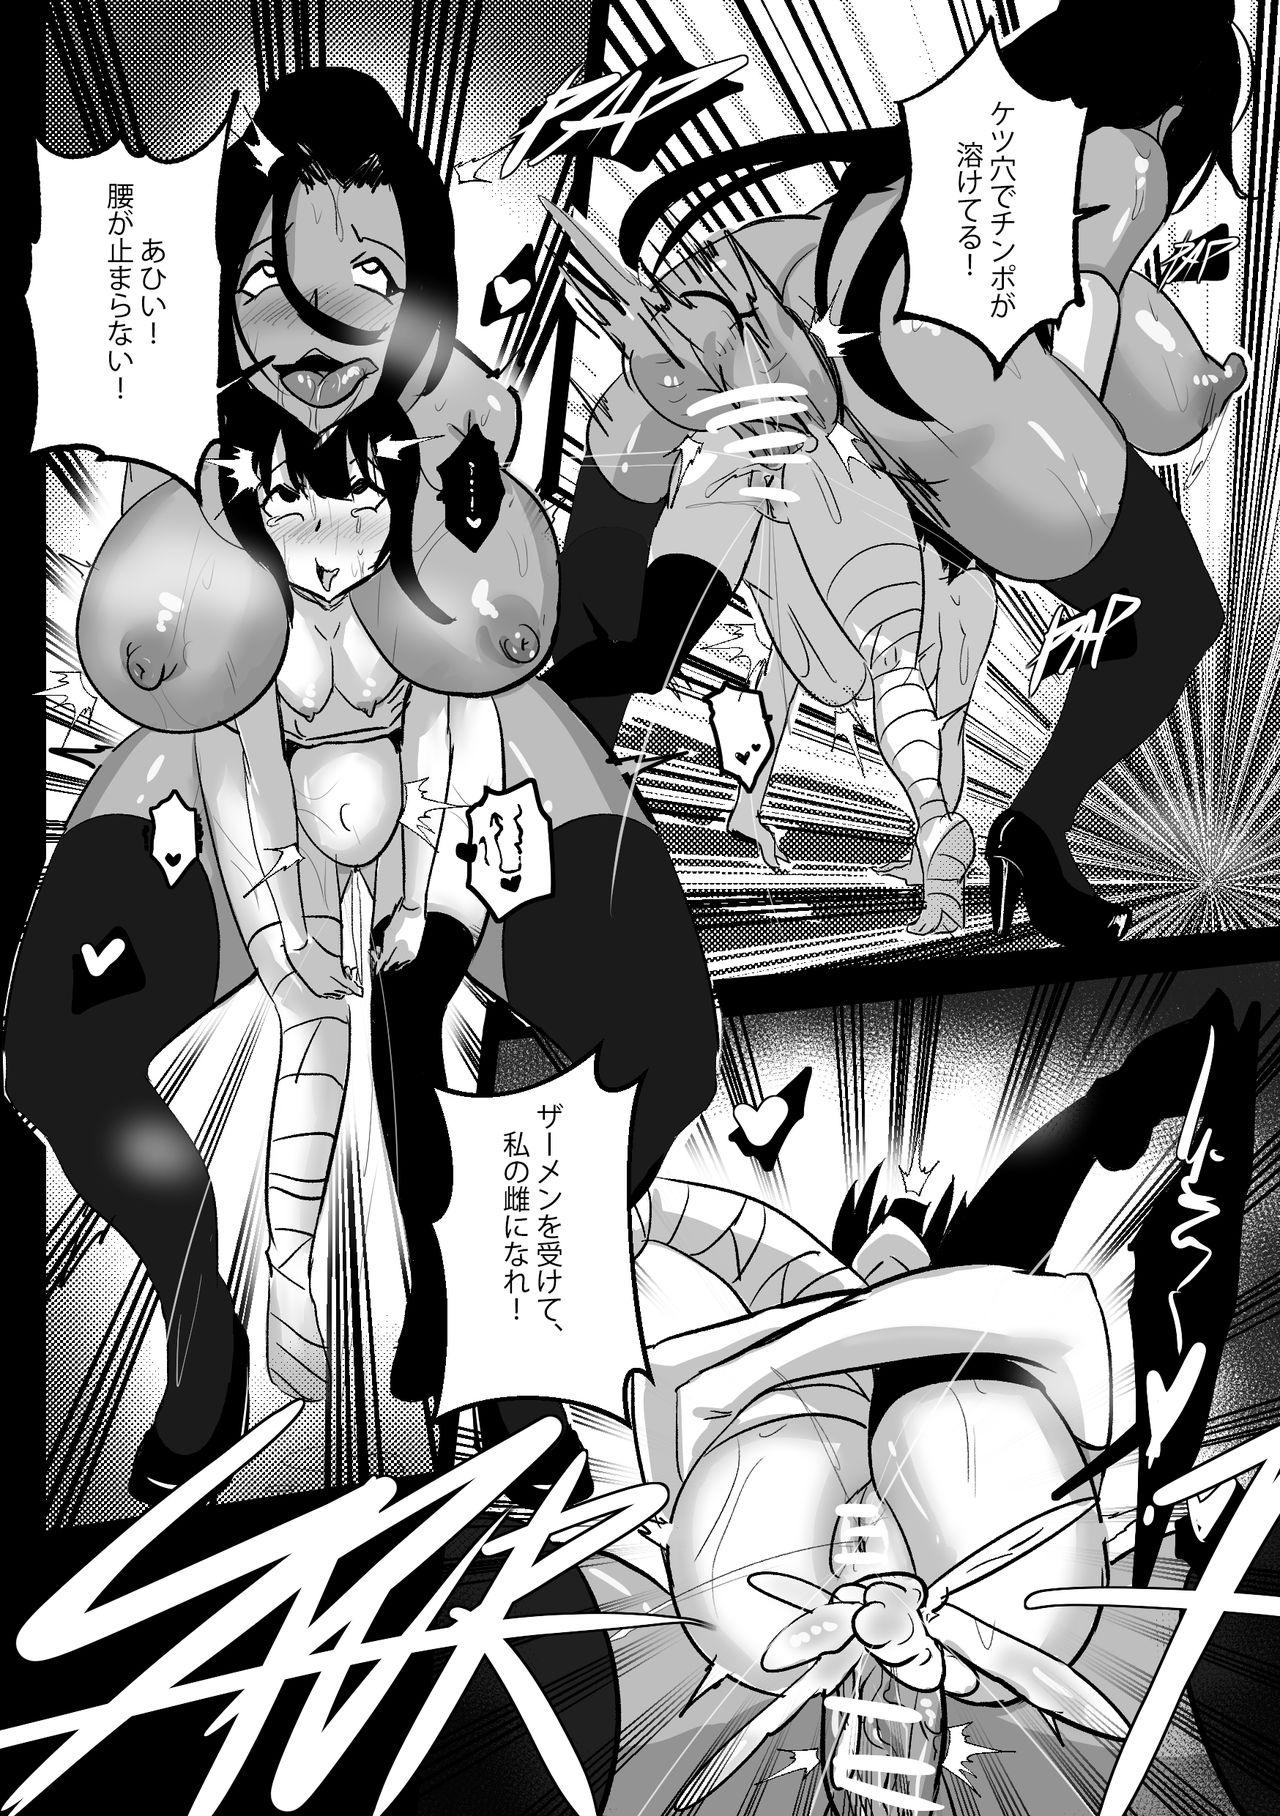 B-Trayal 29 Sylvia(kunosuba) Censored (JP) 11